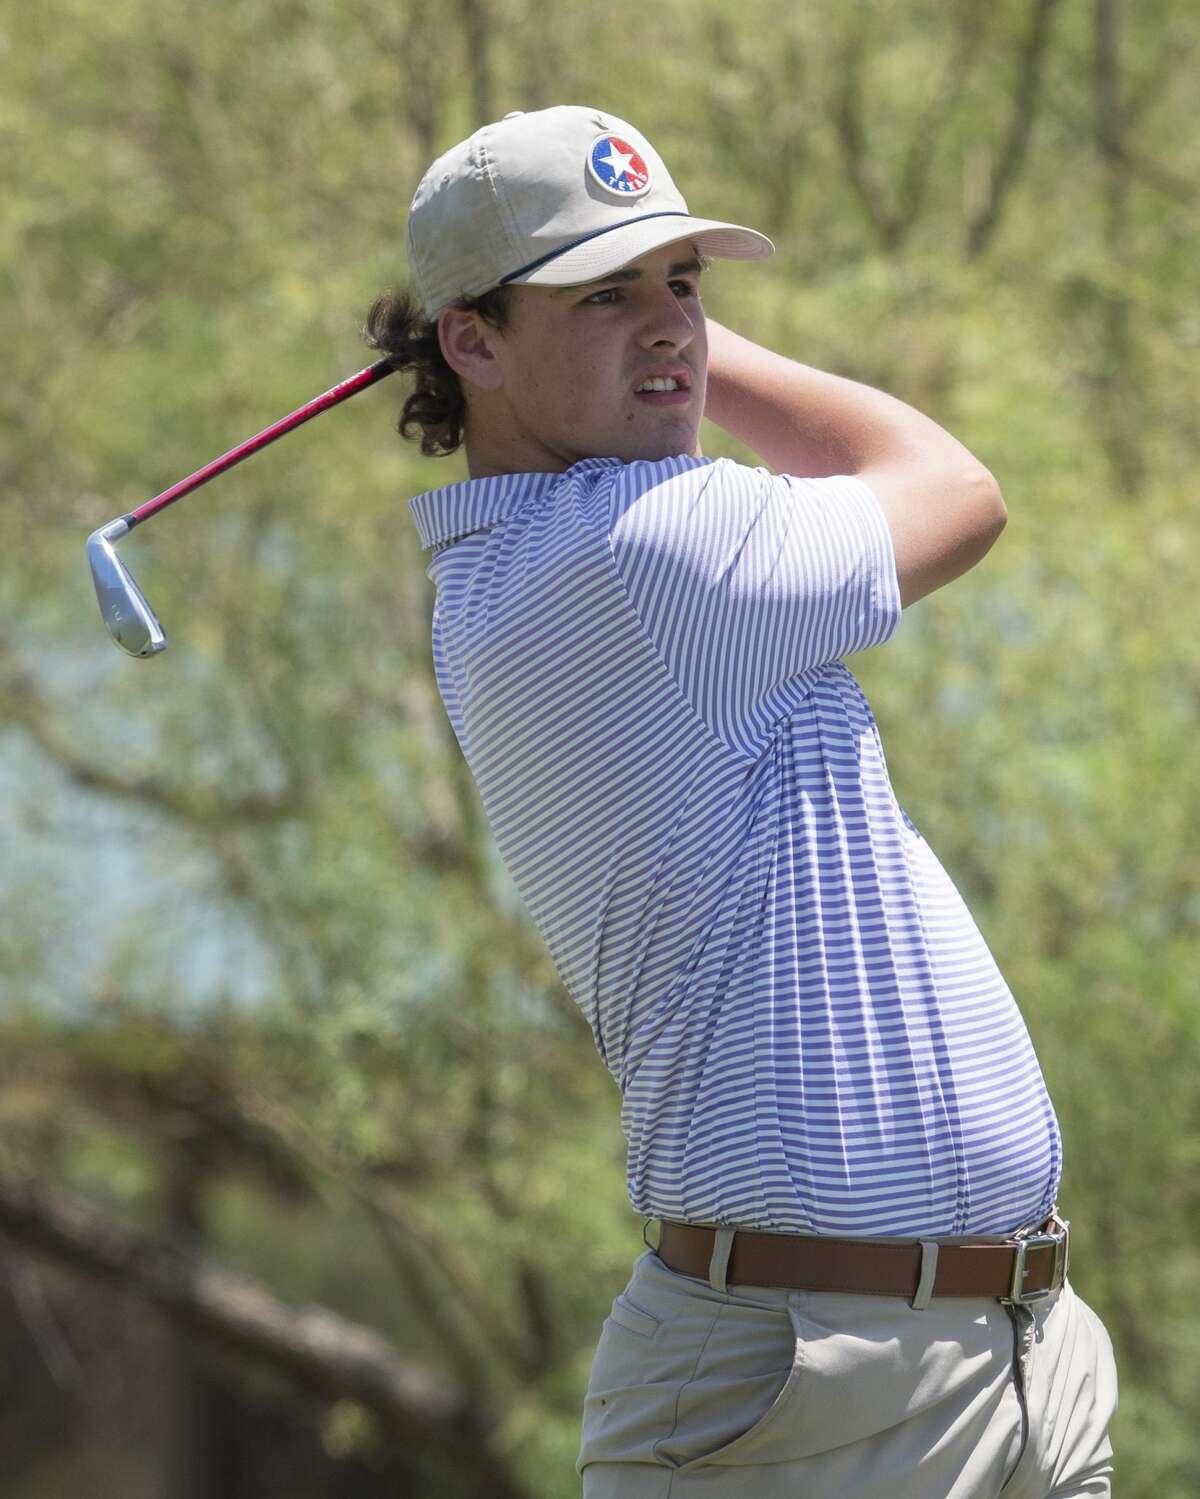 Richman Houston follows his shot 07/31/2020 during the first round of the Midland Men's City Golf Championship at Hogan Park Golf Course. Tim Fischer/Reporter-Telegram